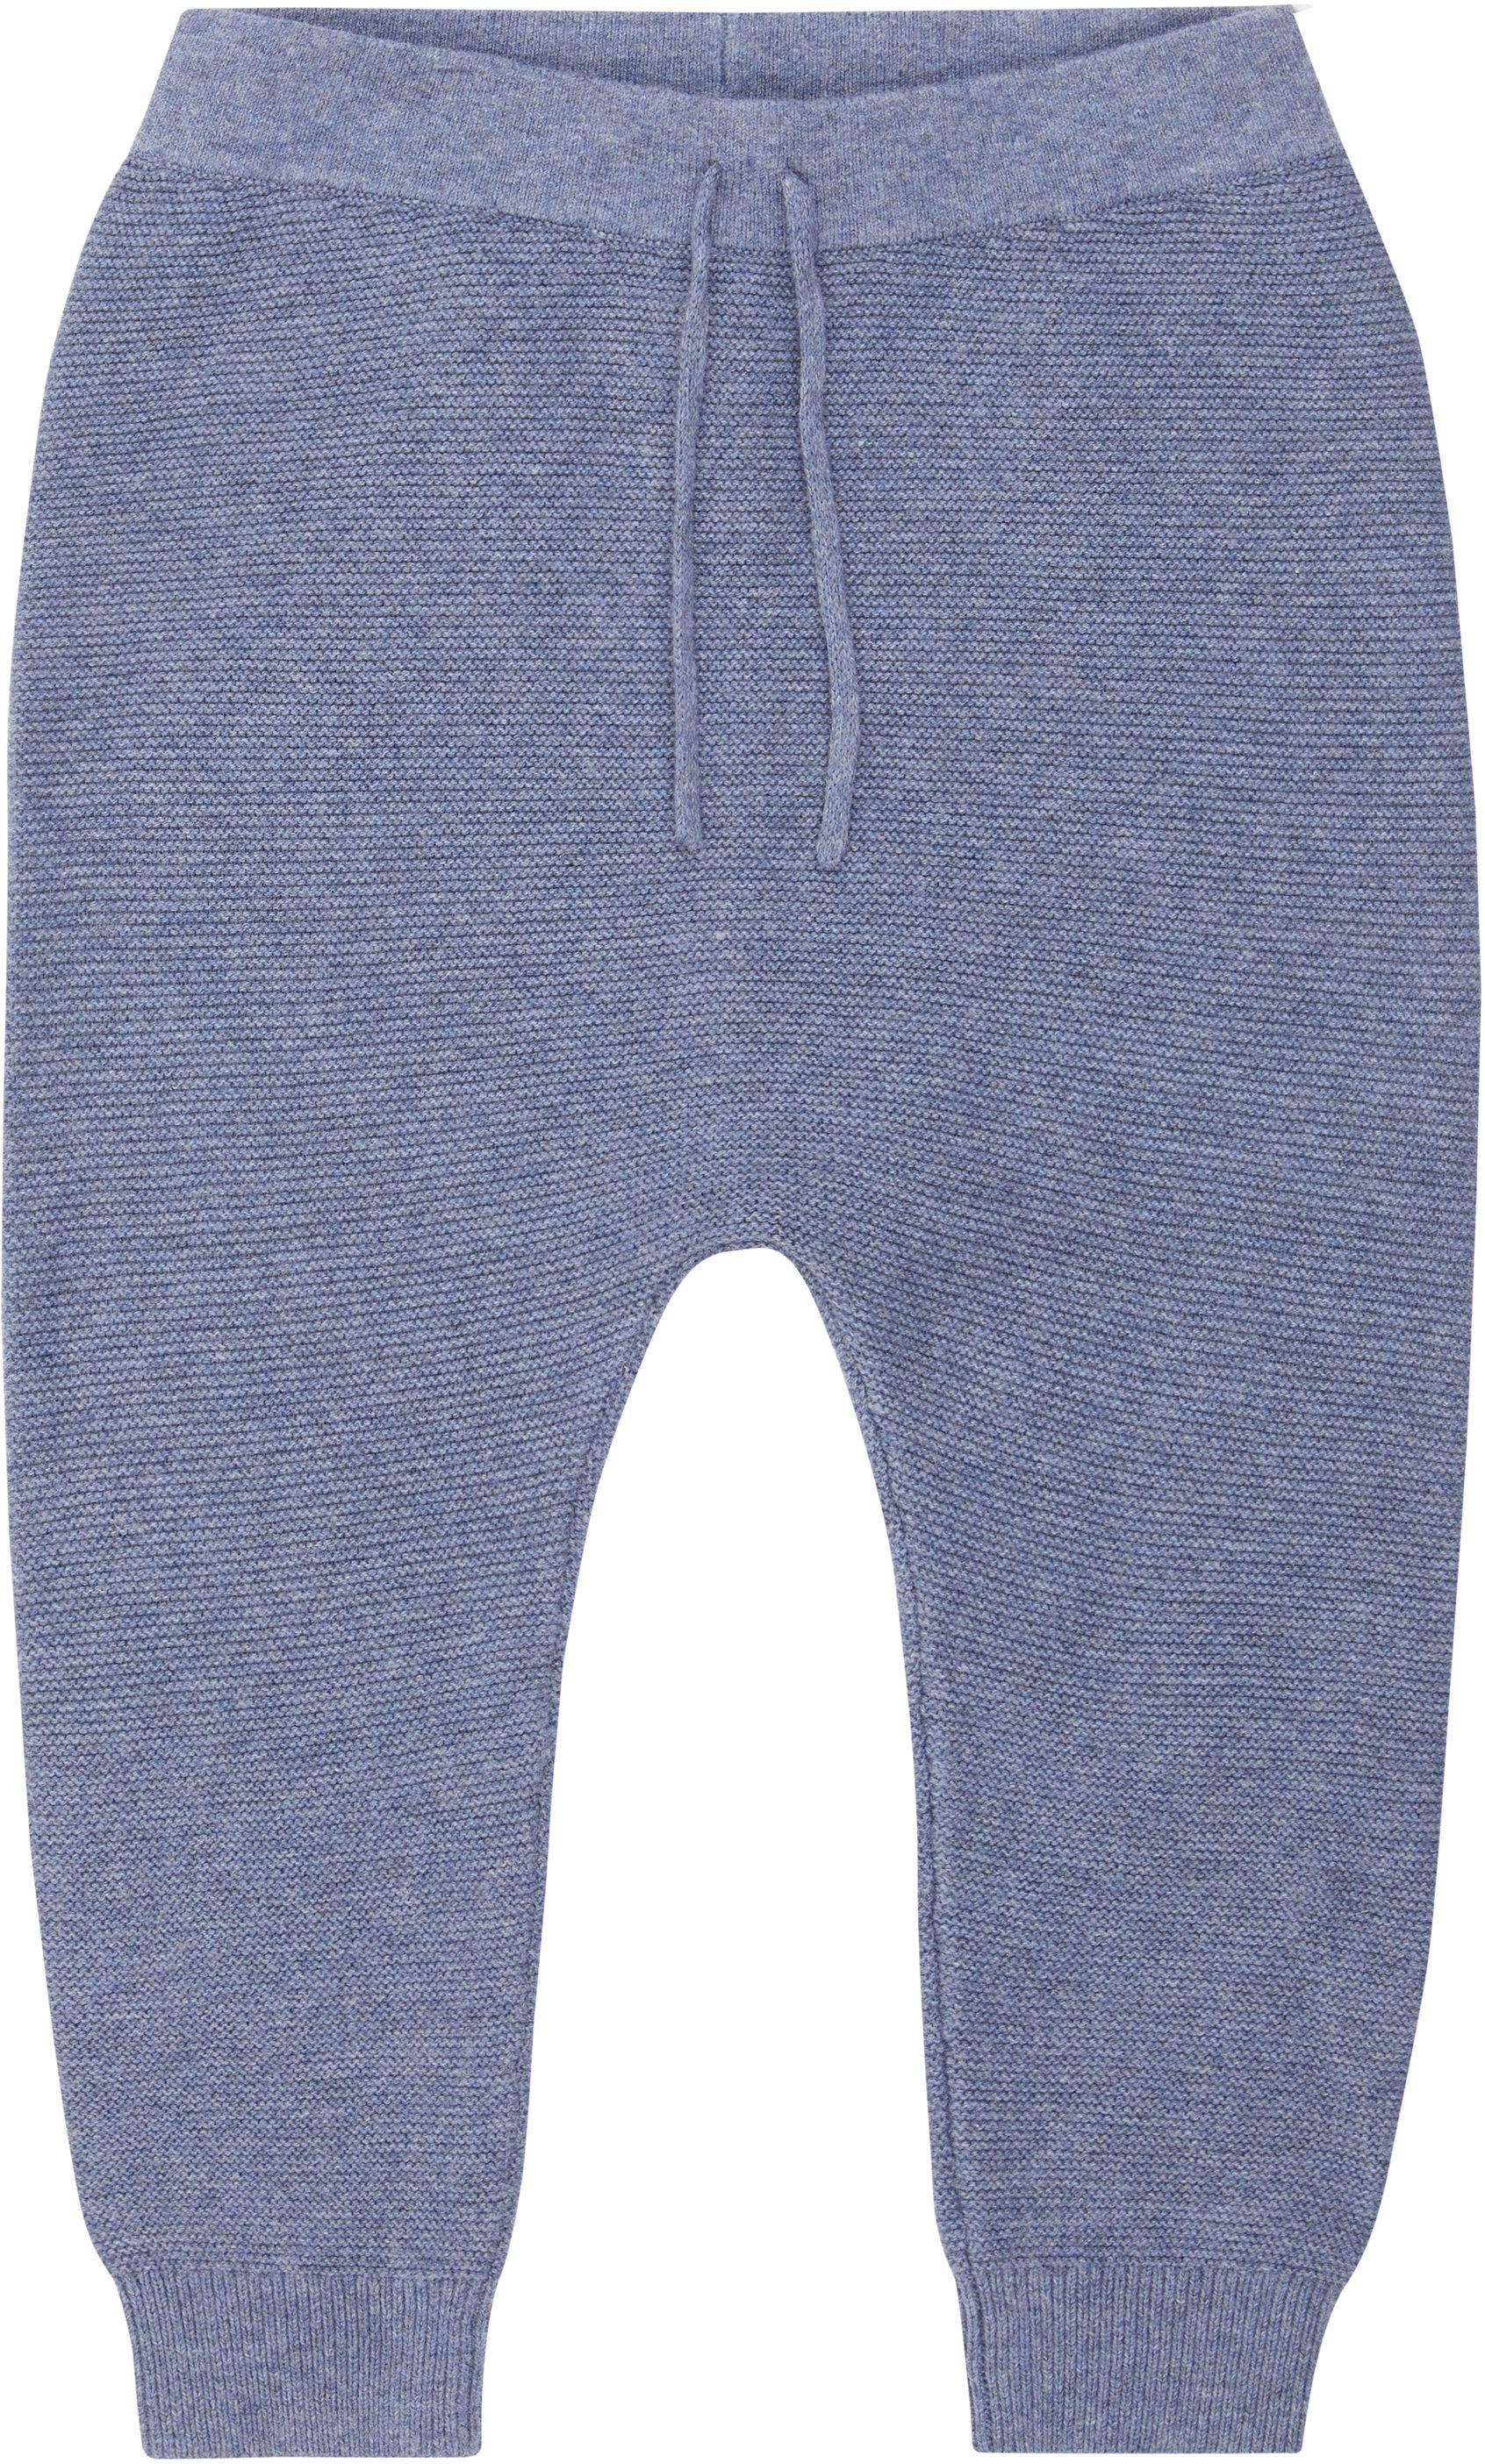 Sense Organic PROUST Knitted Baby Pant Denim Blue